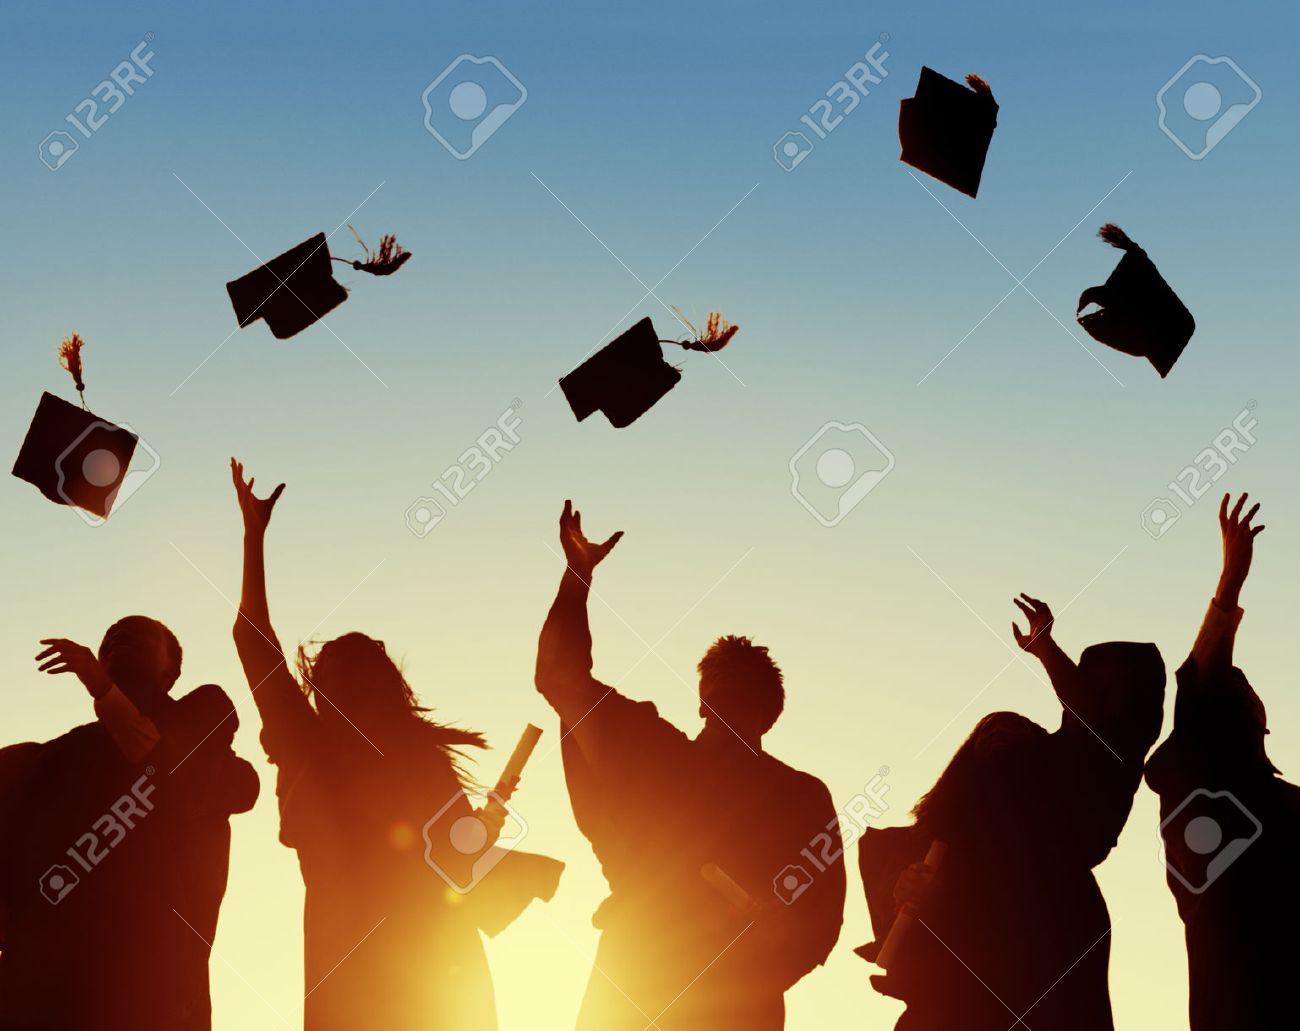 Celebration Education Graduation Student Success Learning Concept Stock Photo - 46312047